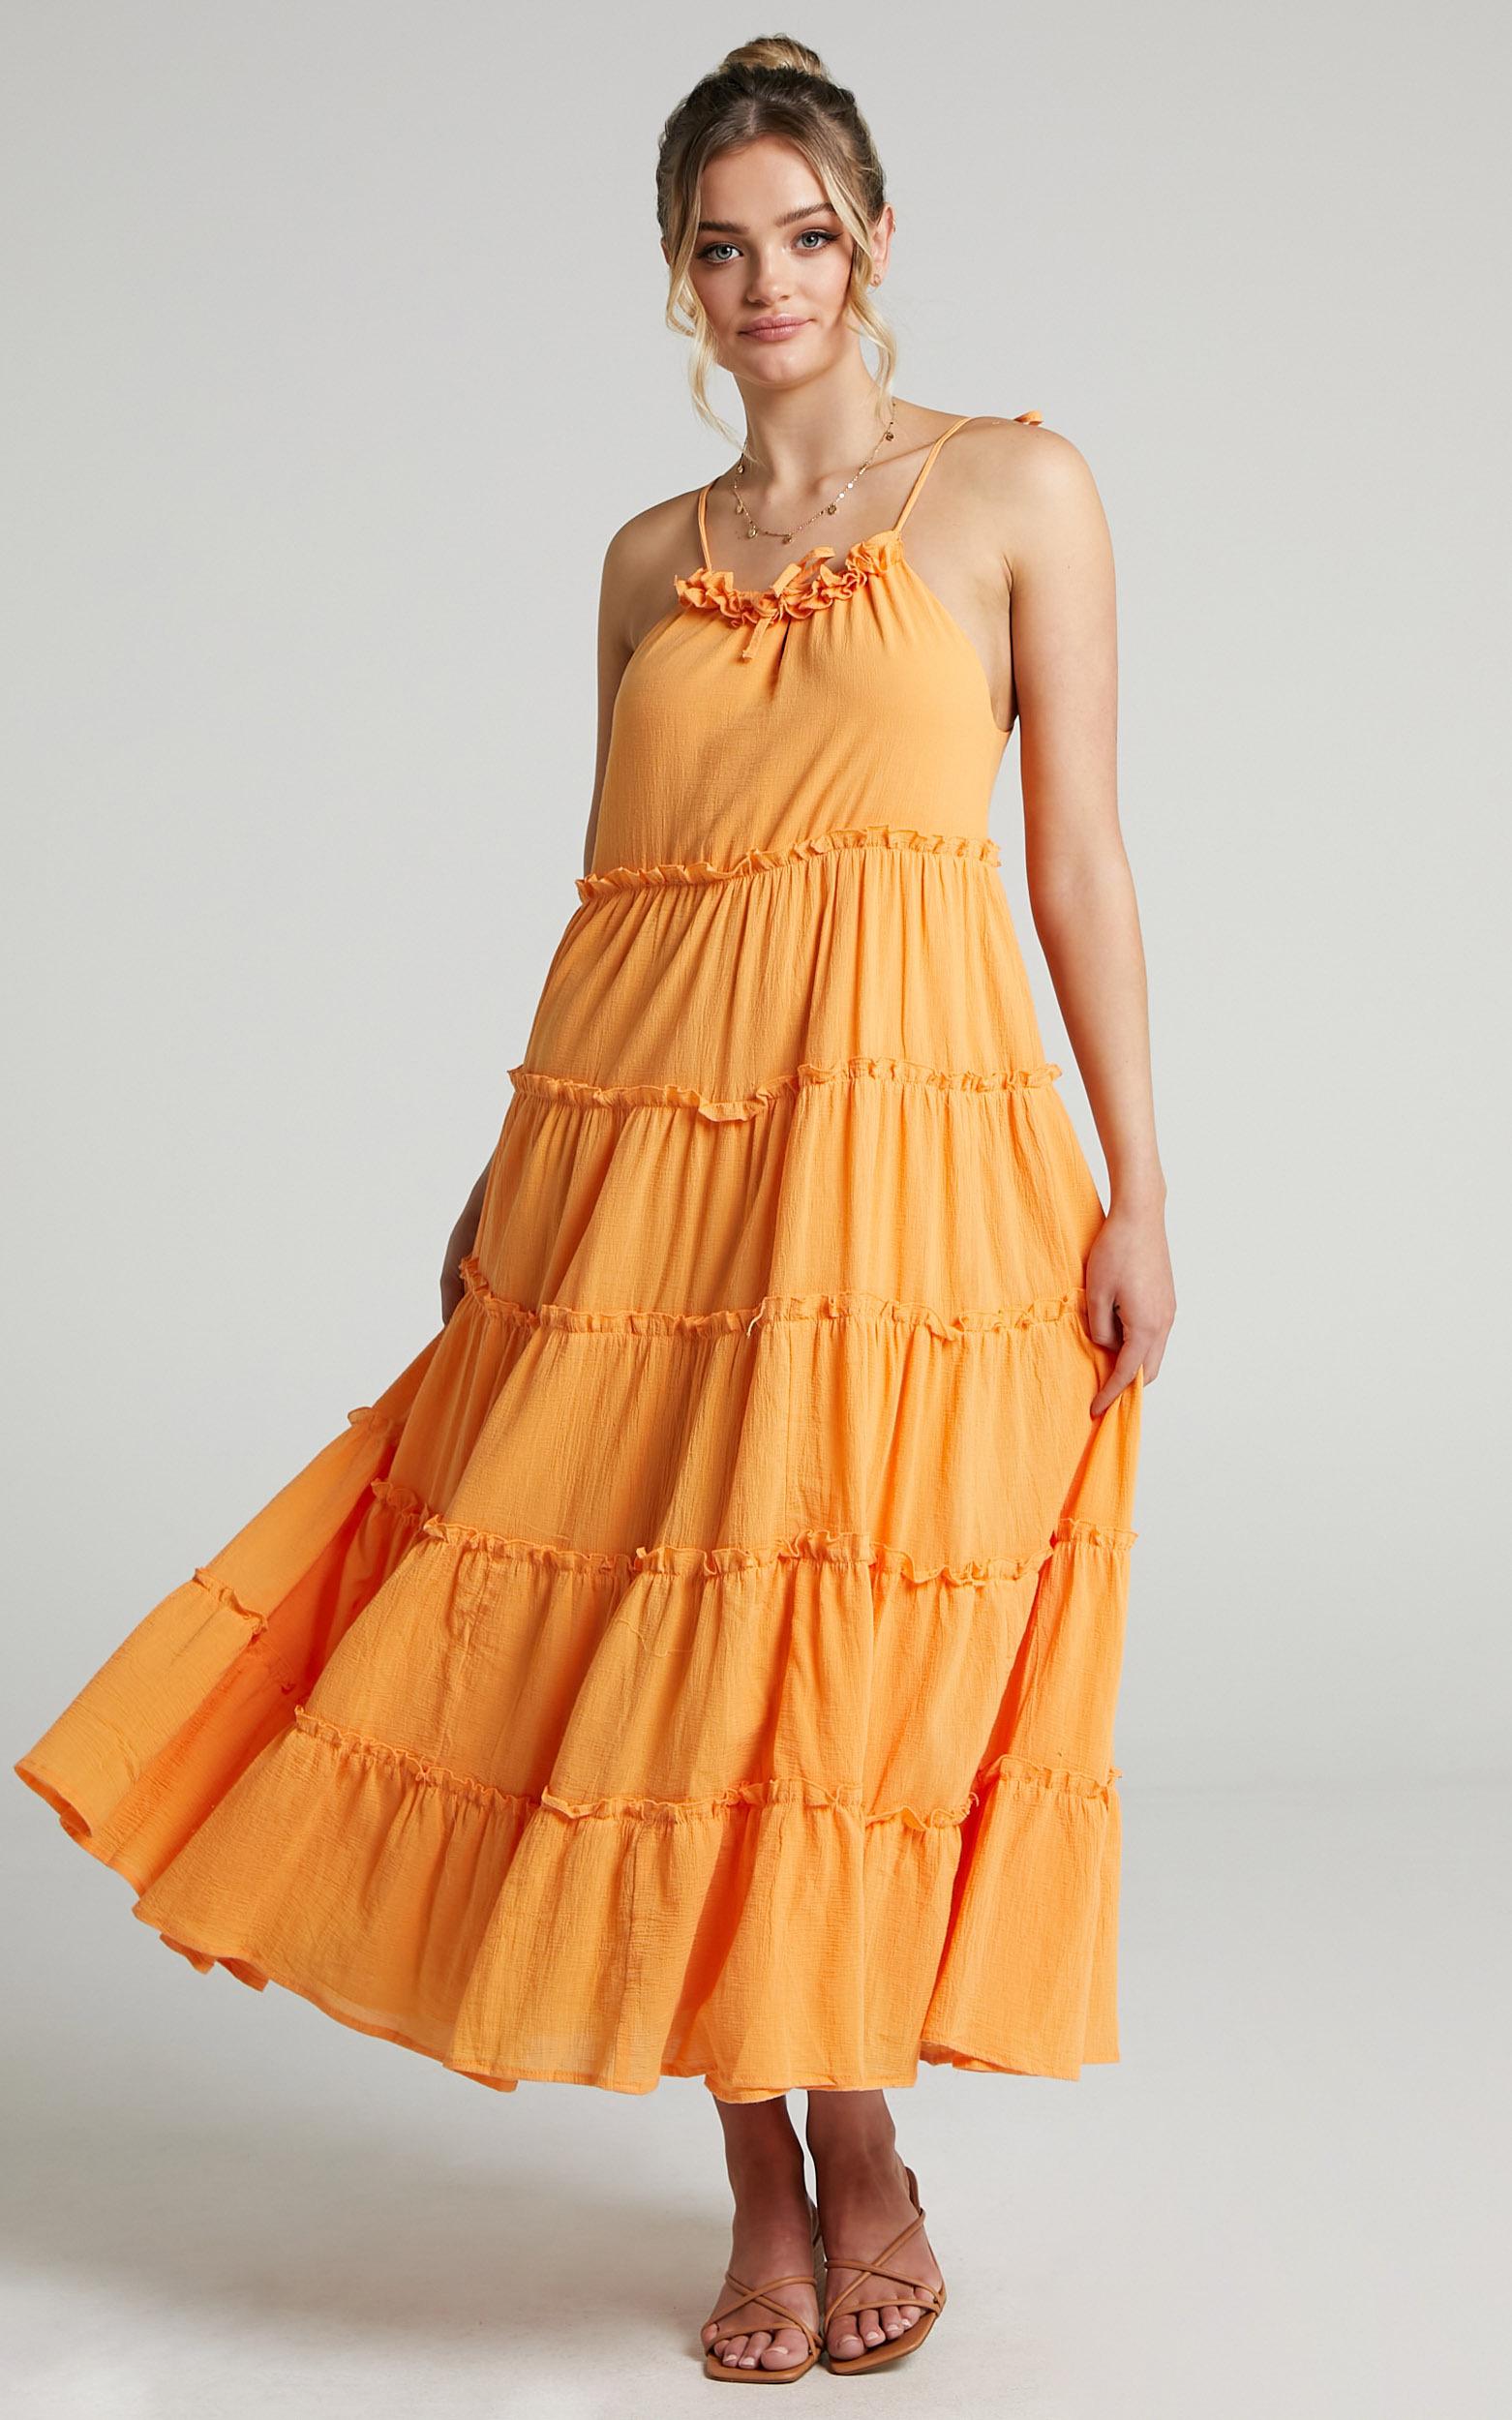 Charlie Holiday - Senorita Maxi Dress in Apricot - 06, ORG1, hi-res image number null